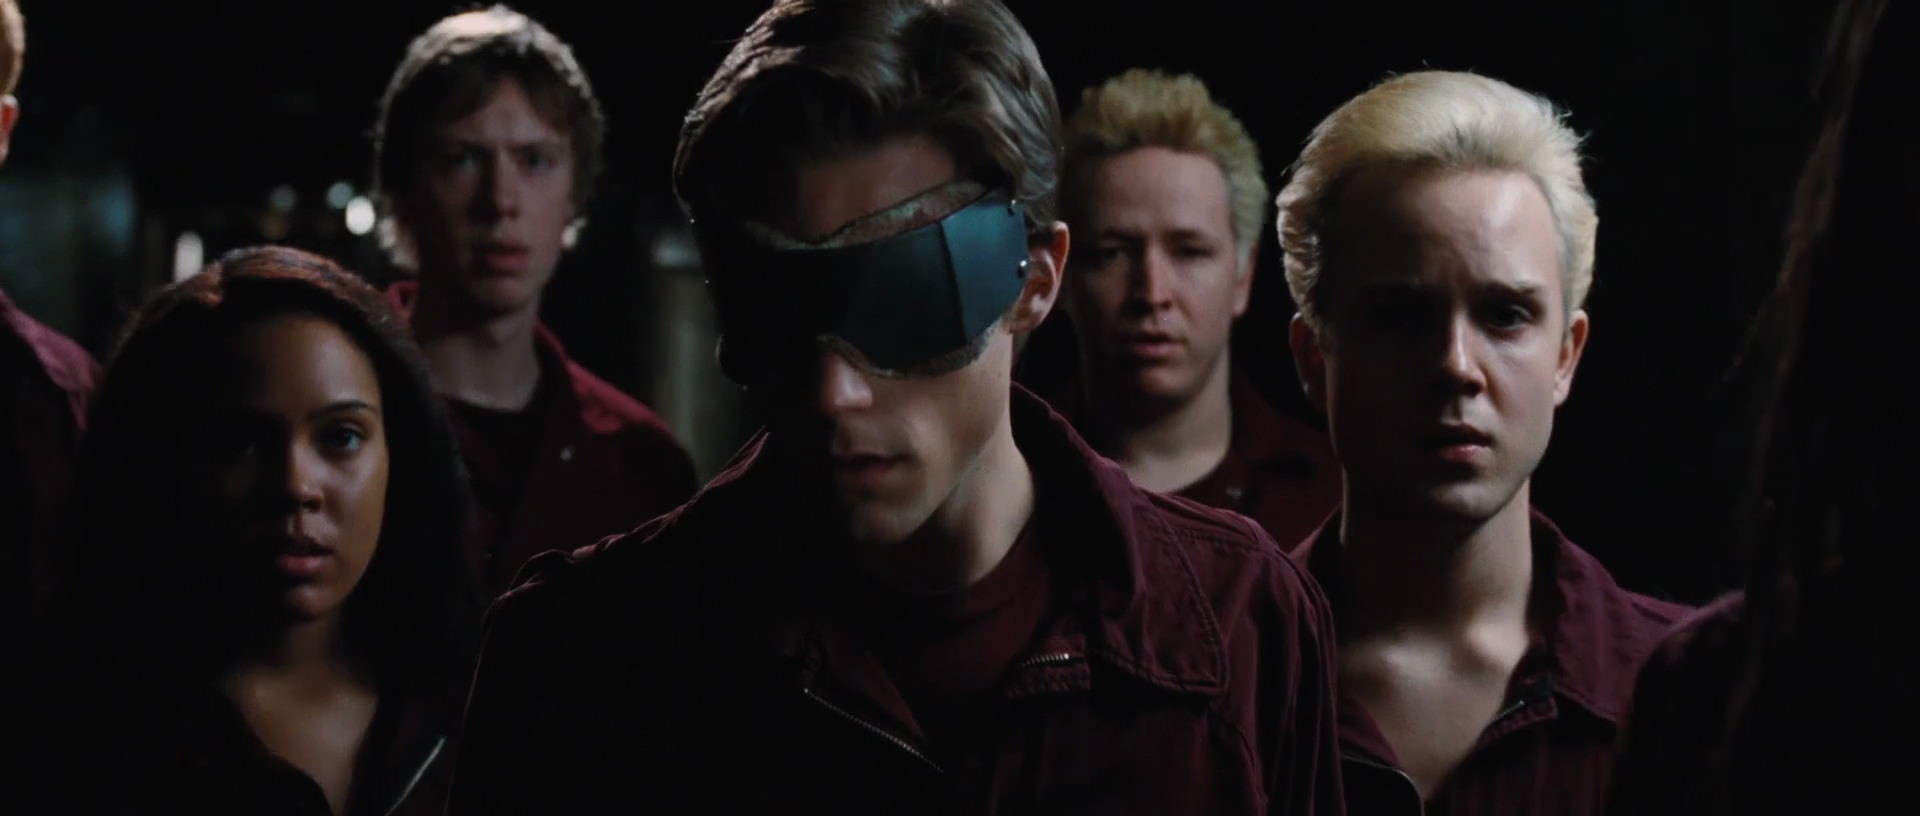 0f90f7f1d320 Scott leads the mutant prisoners.